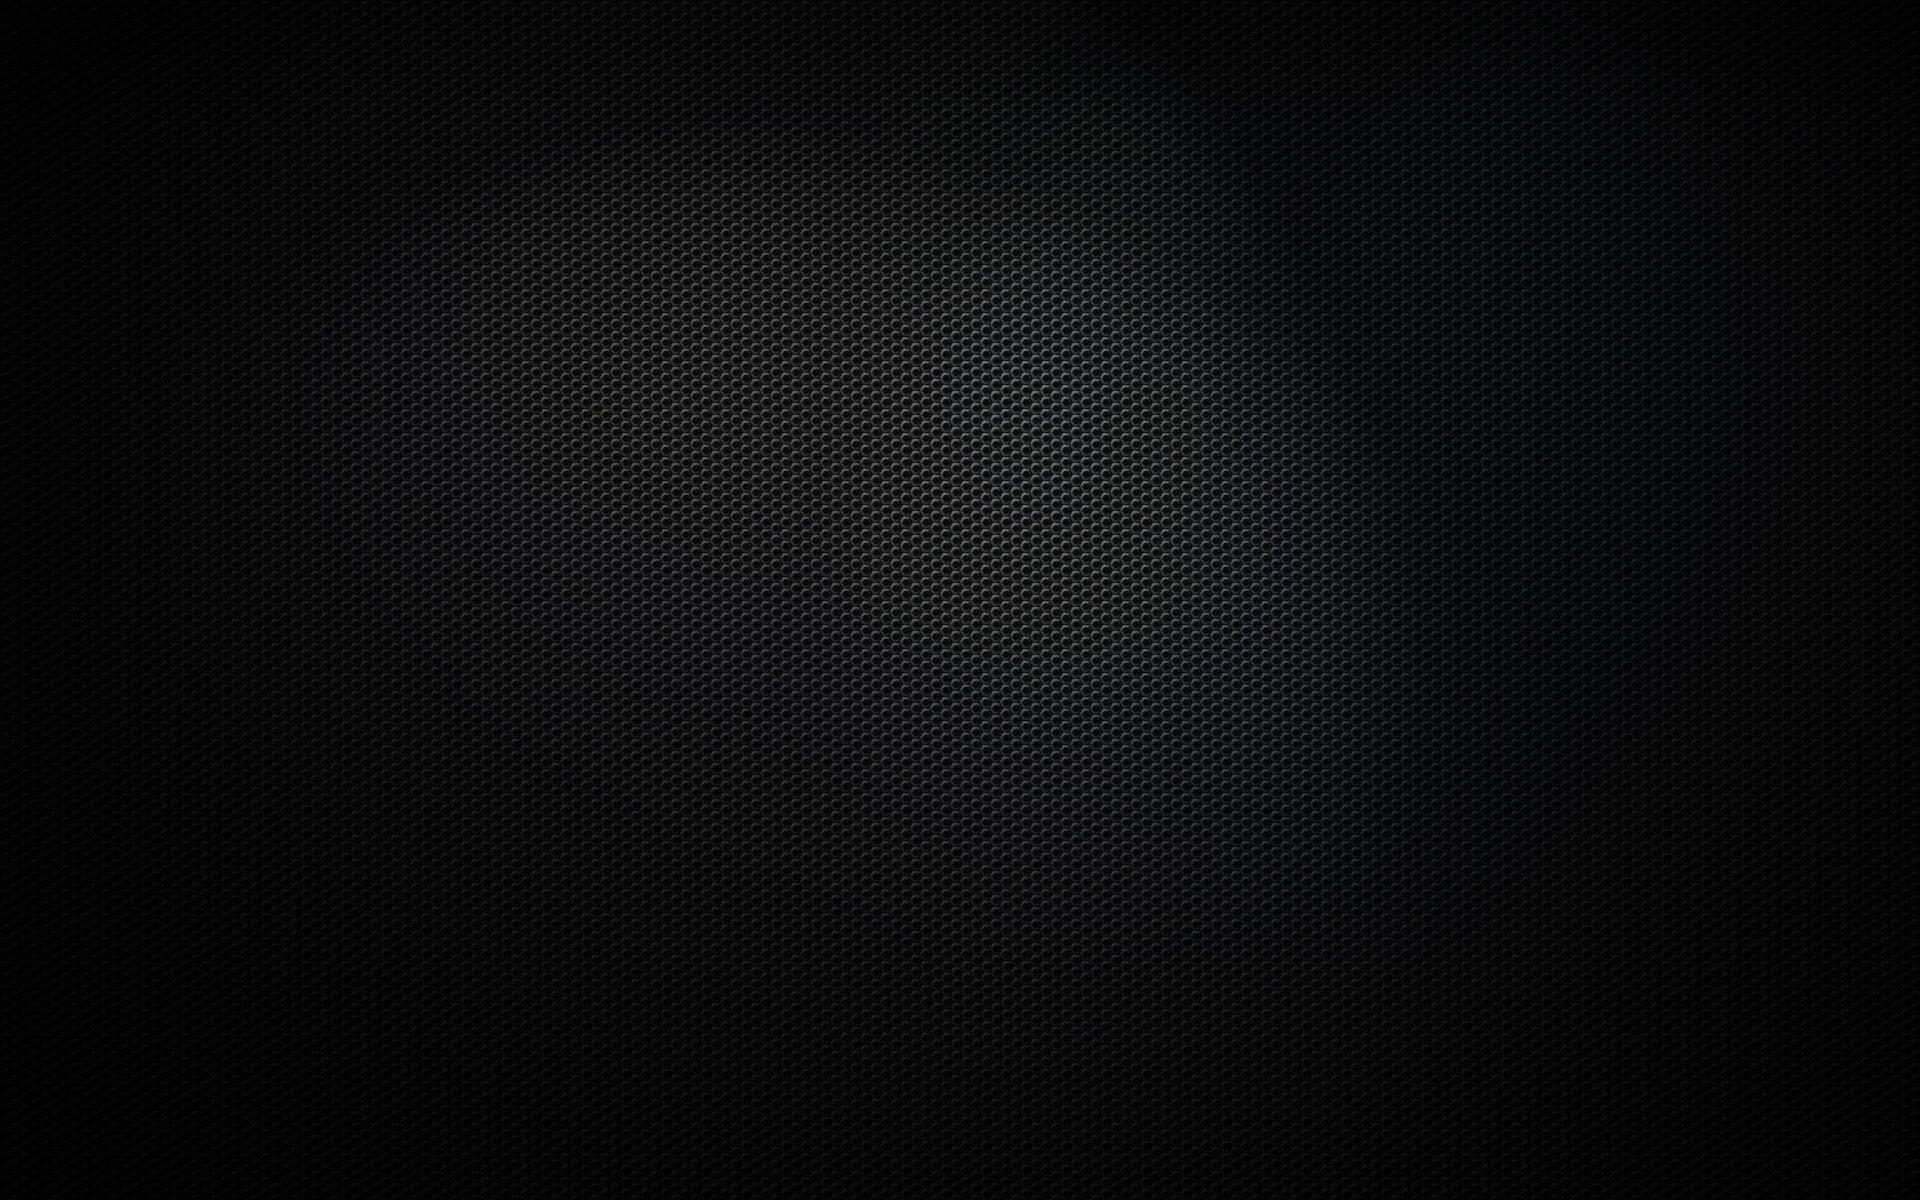 Carbon Custom Pattern 1054669 Wallpaper wallpaper